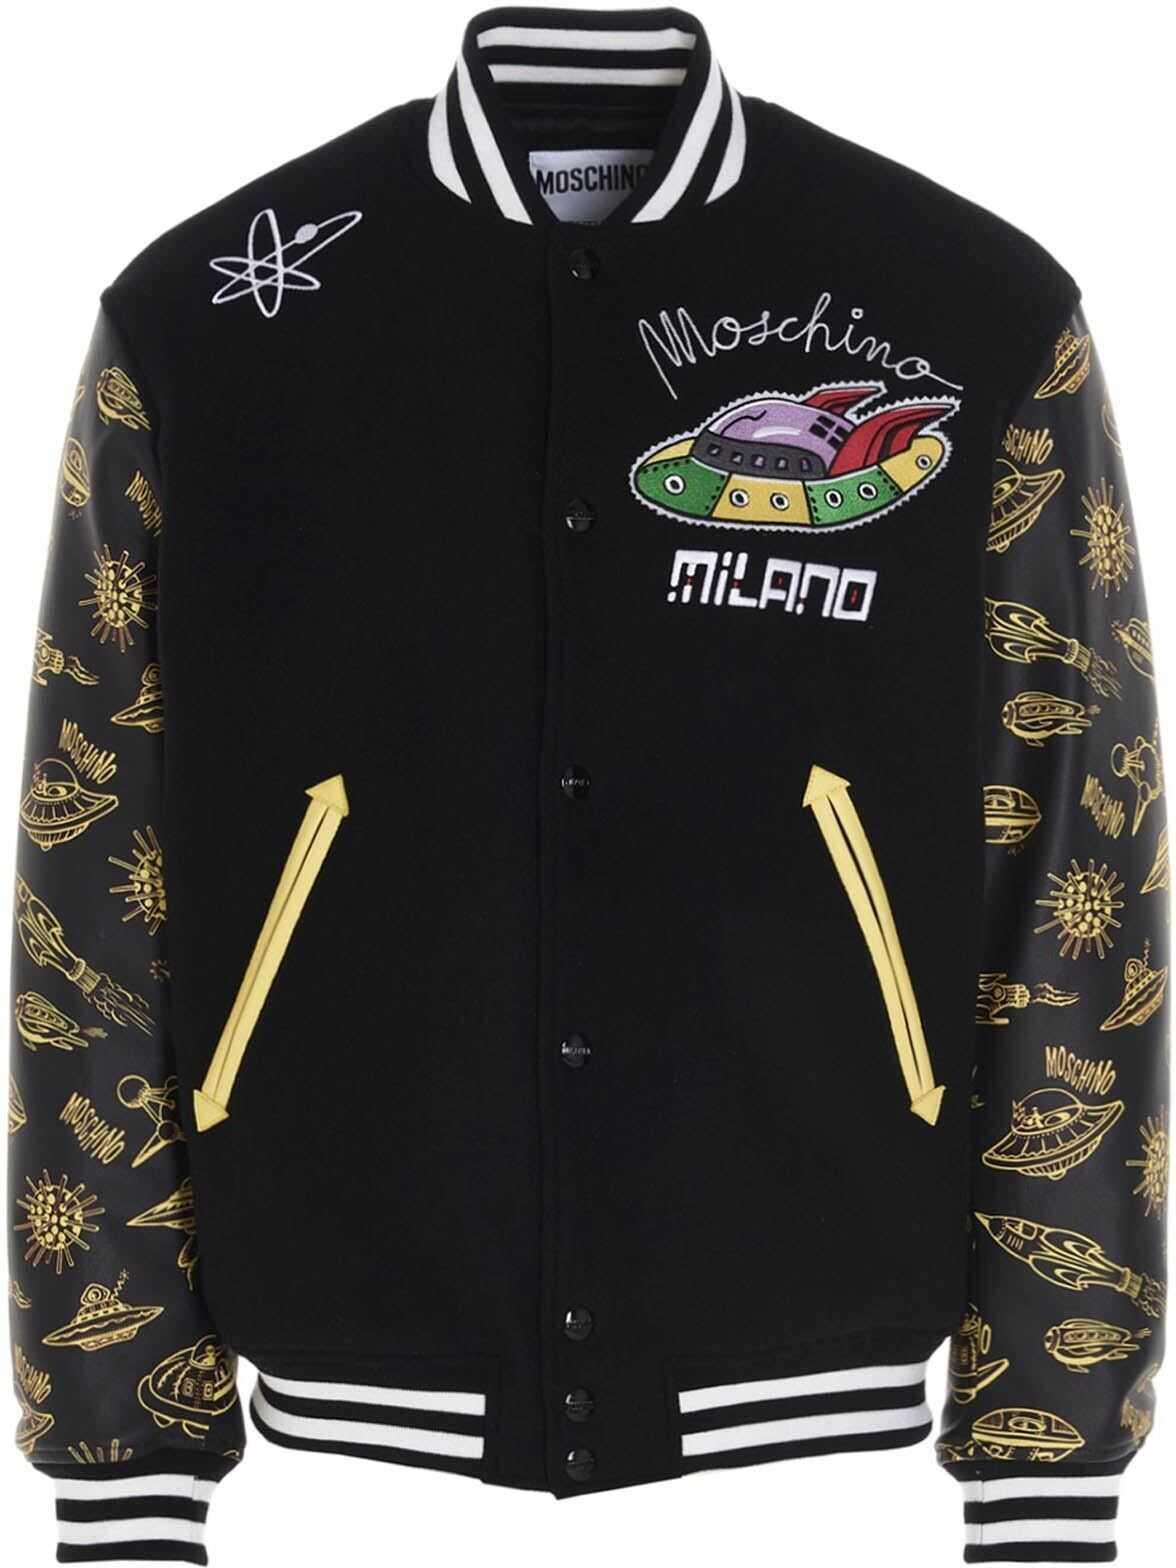 Moschino Moschino Galaxy Bomber Jacket In Black Black imagine